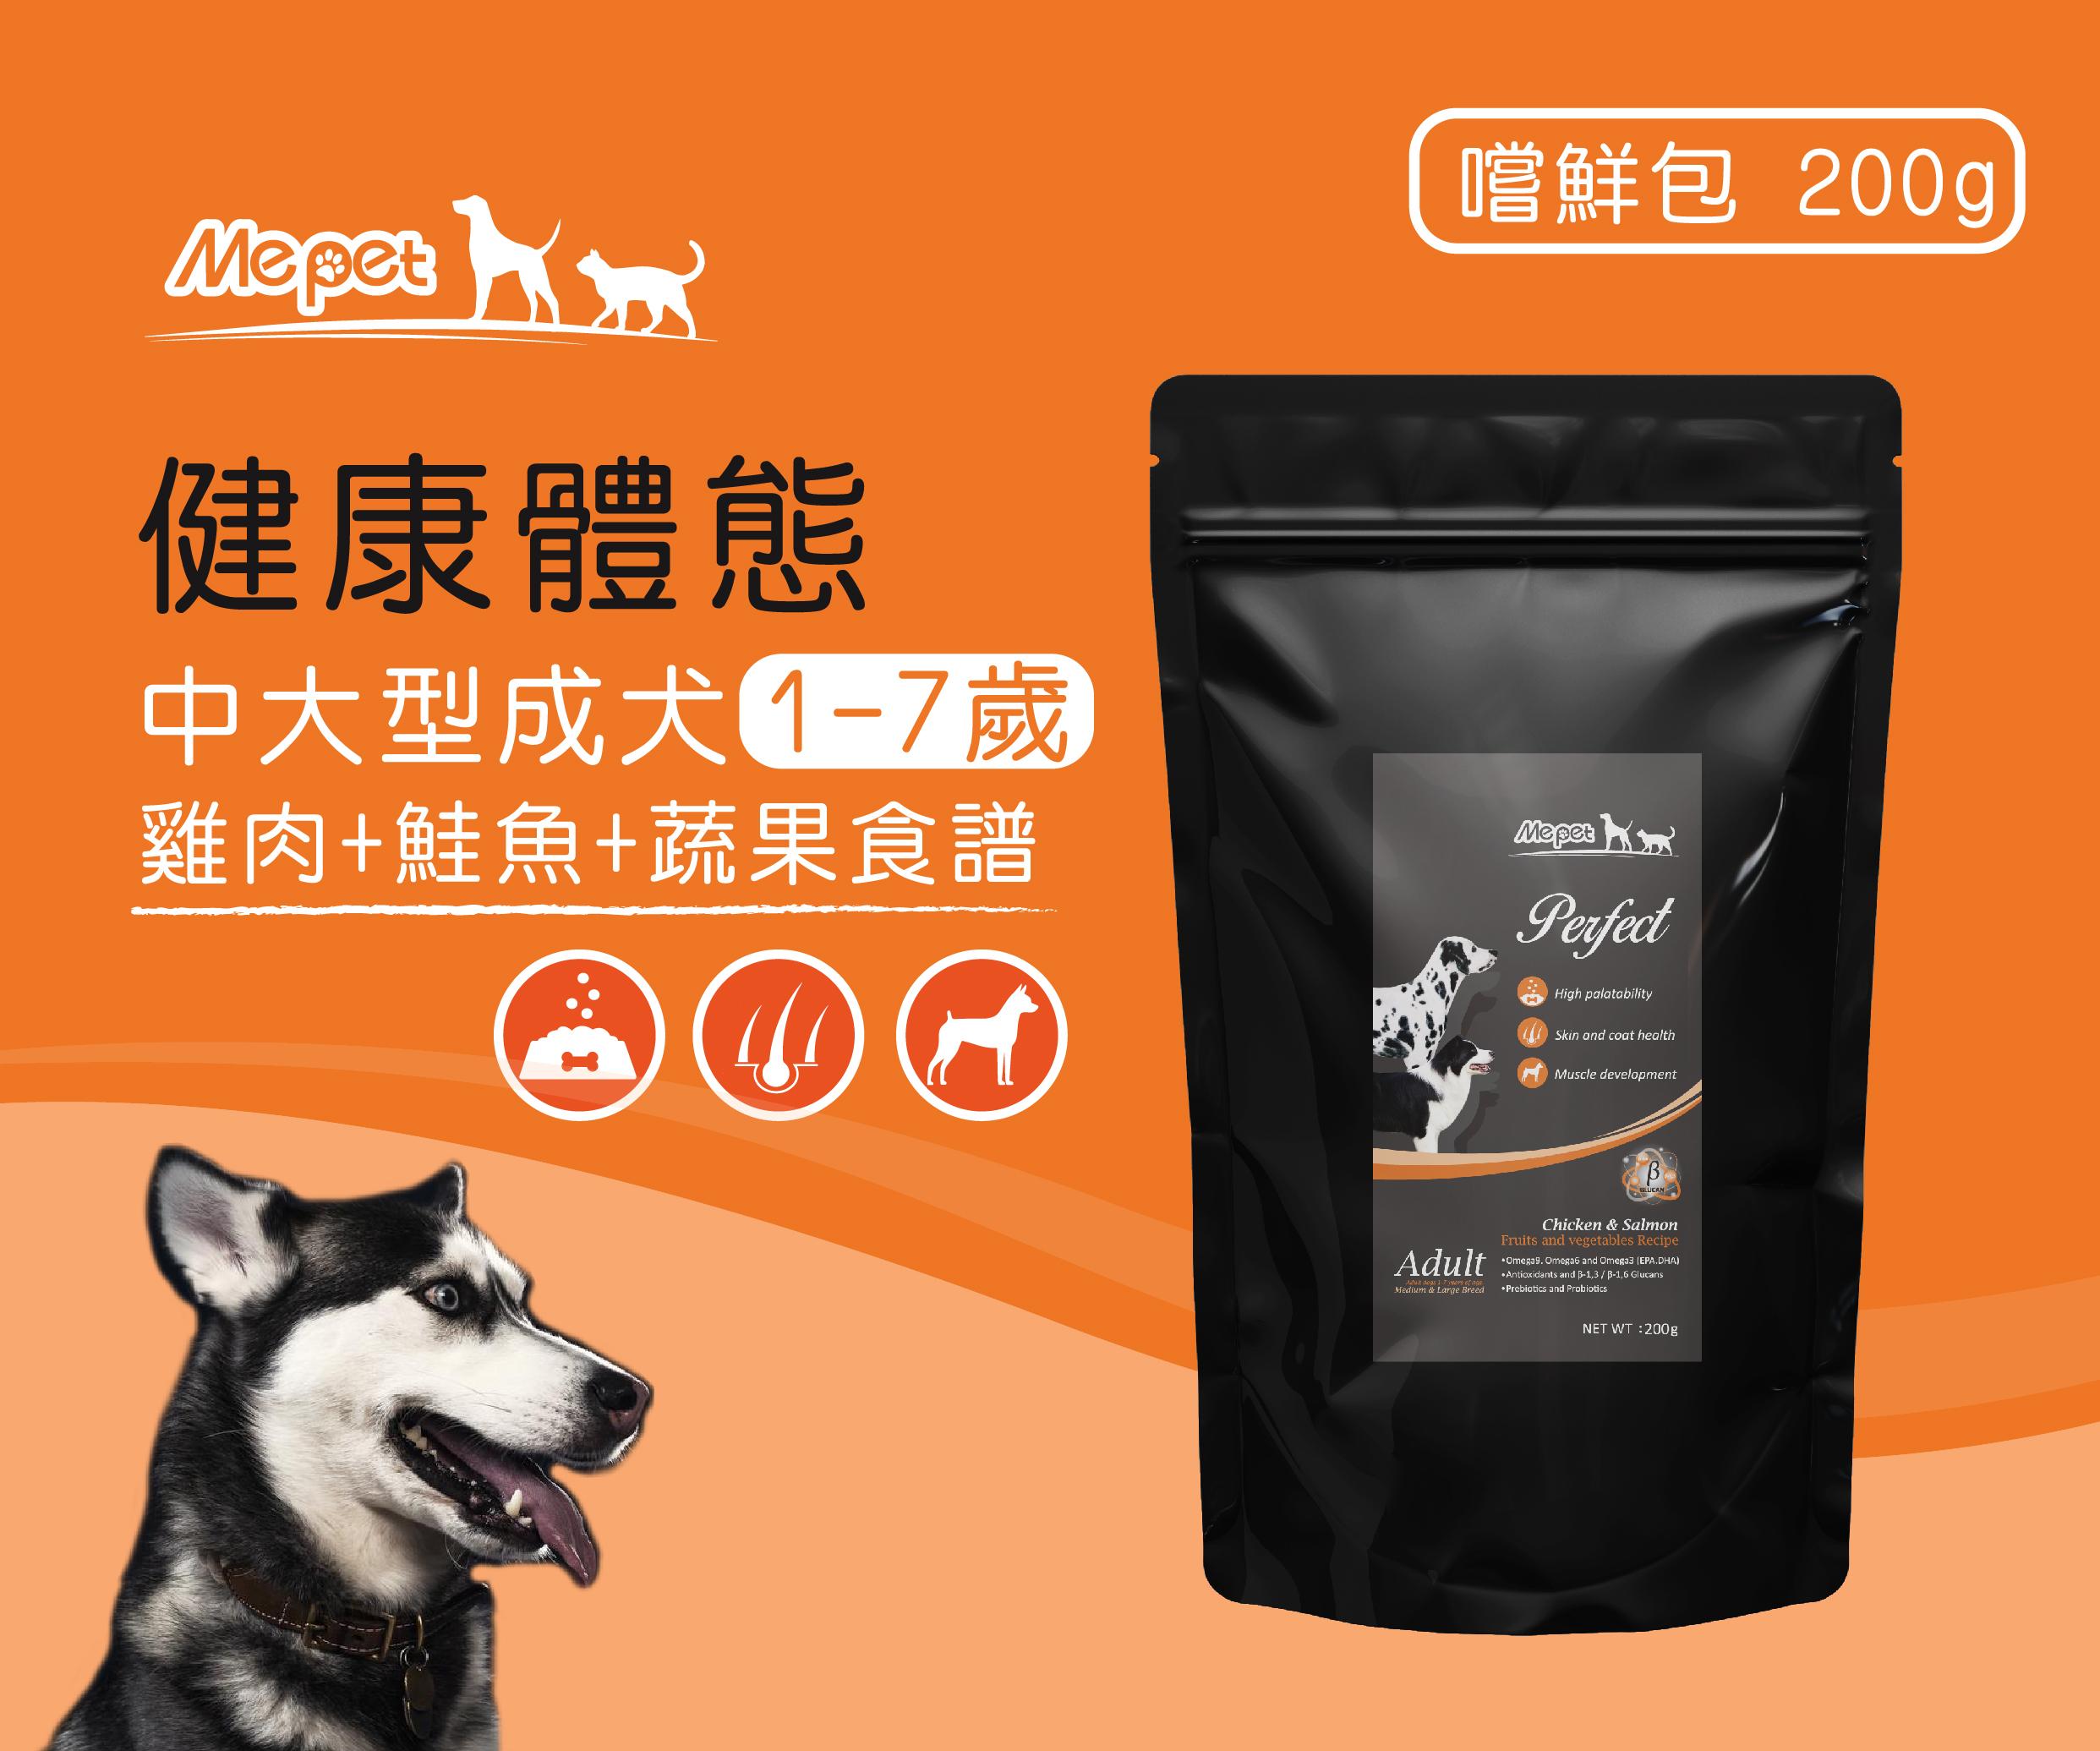 MEPET 中大型犬飼料│大顆粒口感酥脆,高適口性的乾糧,均衡營養,添加毛髮亮麗成分,讓愛犬擁有健康好體態